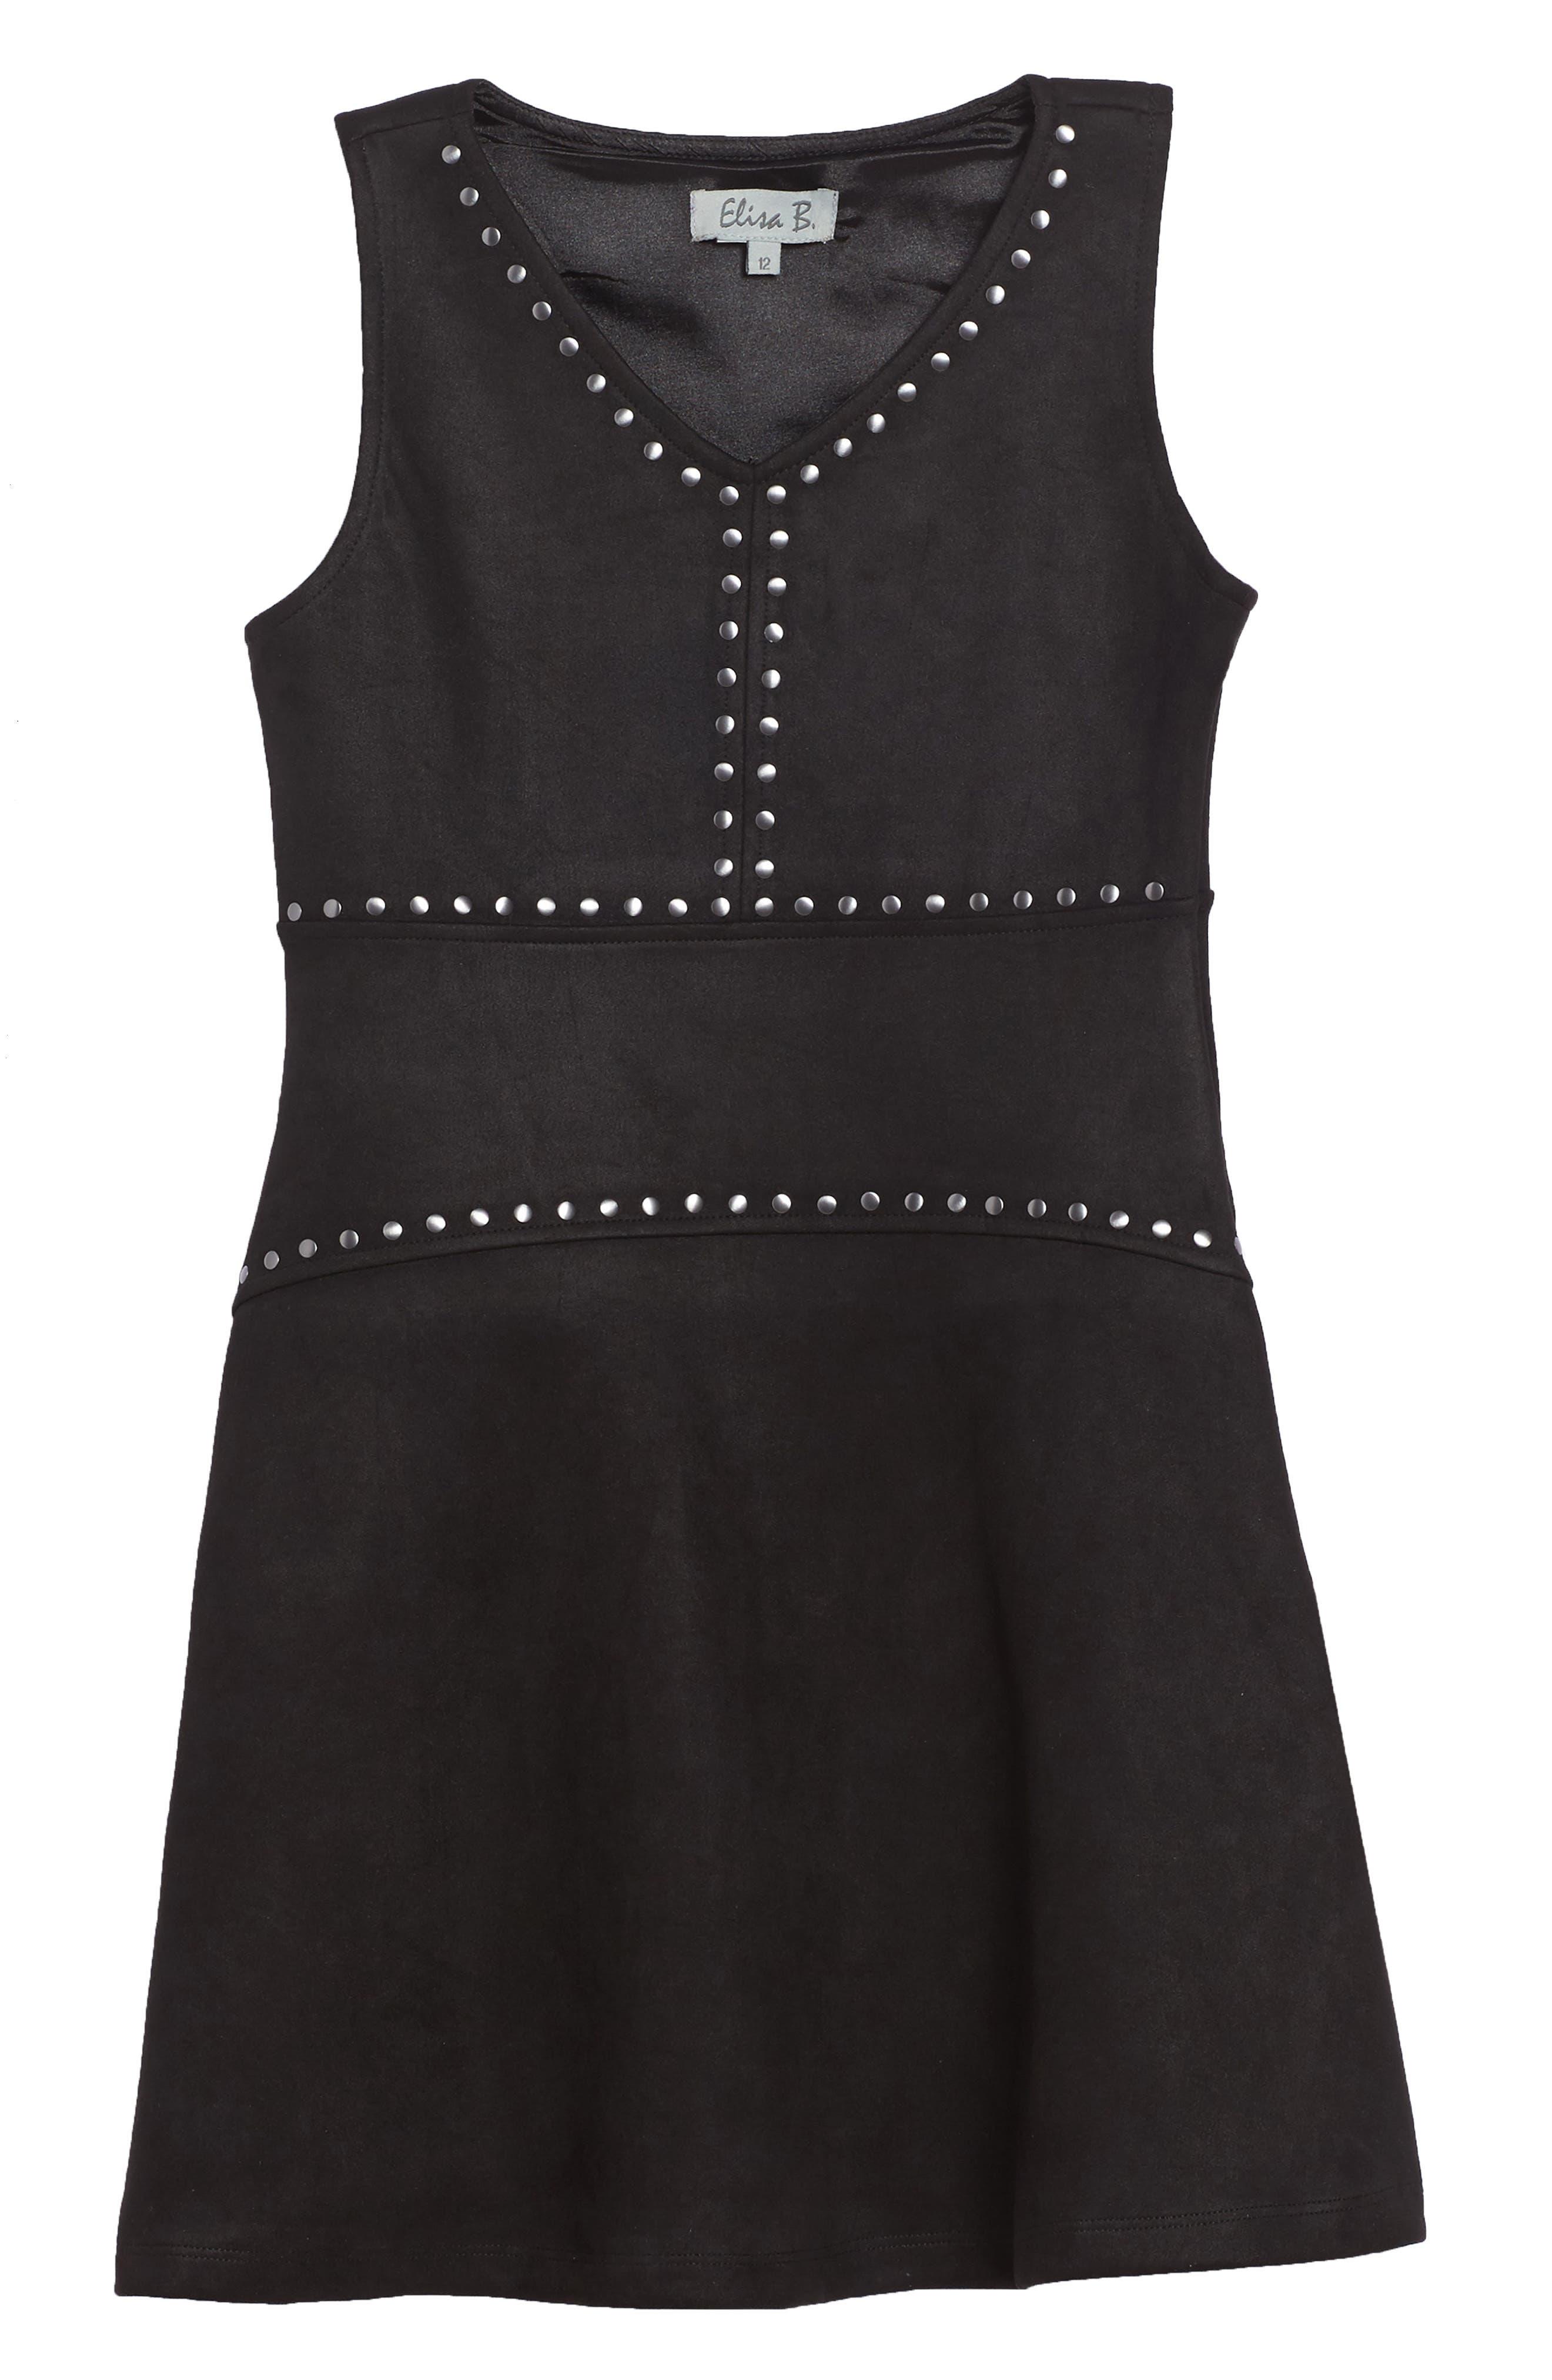 Main Image - Elisa B Studded Sleeveless Dress (Big Girls)